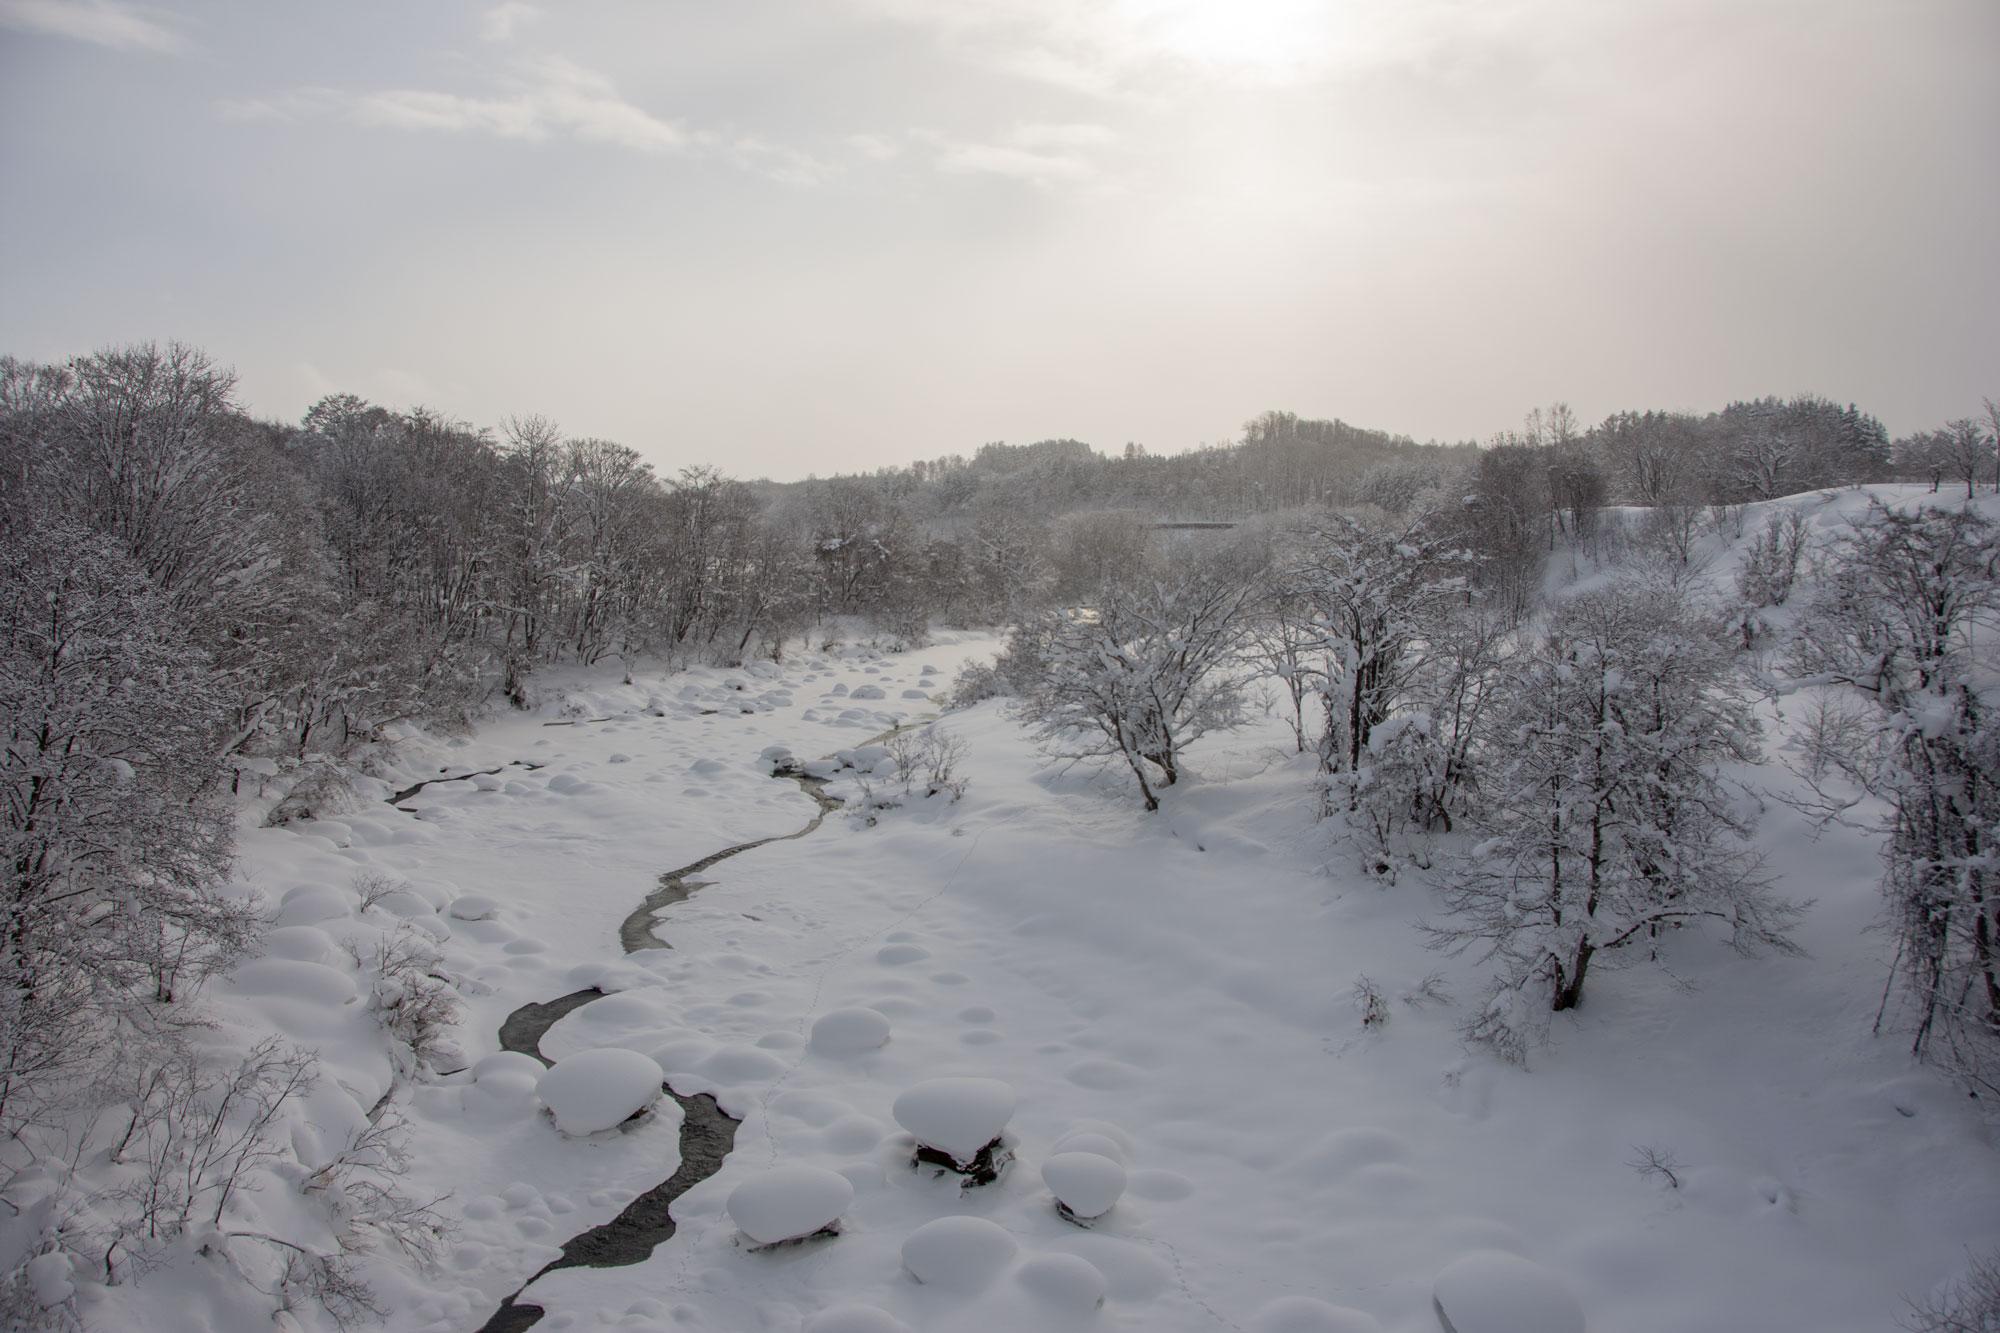 shiribetsu river mid winter in niseko